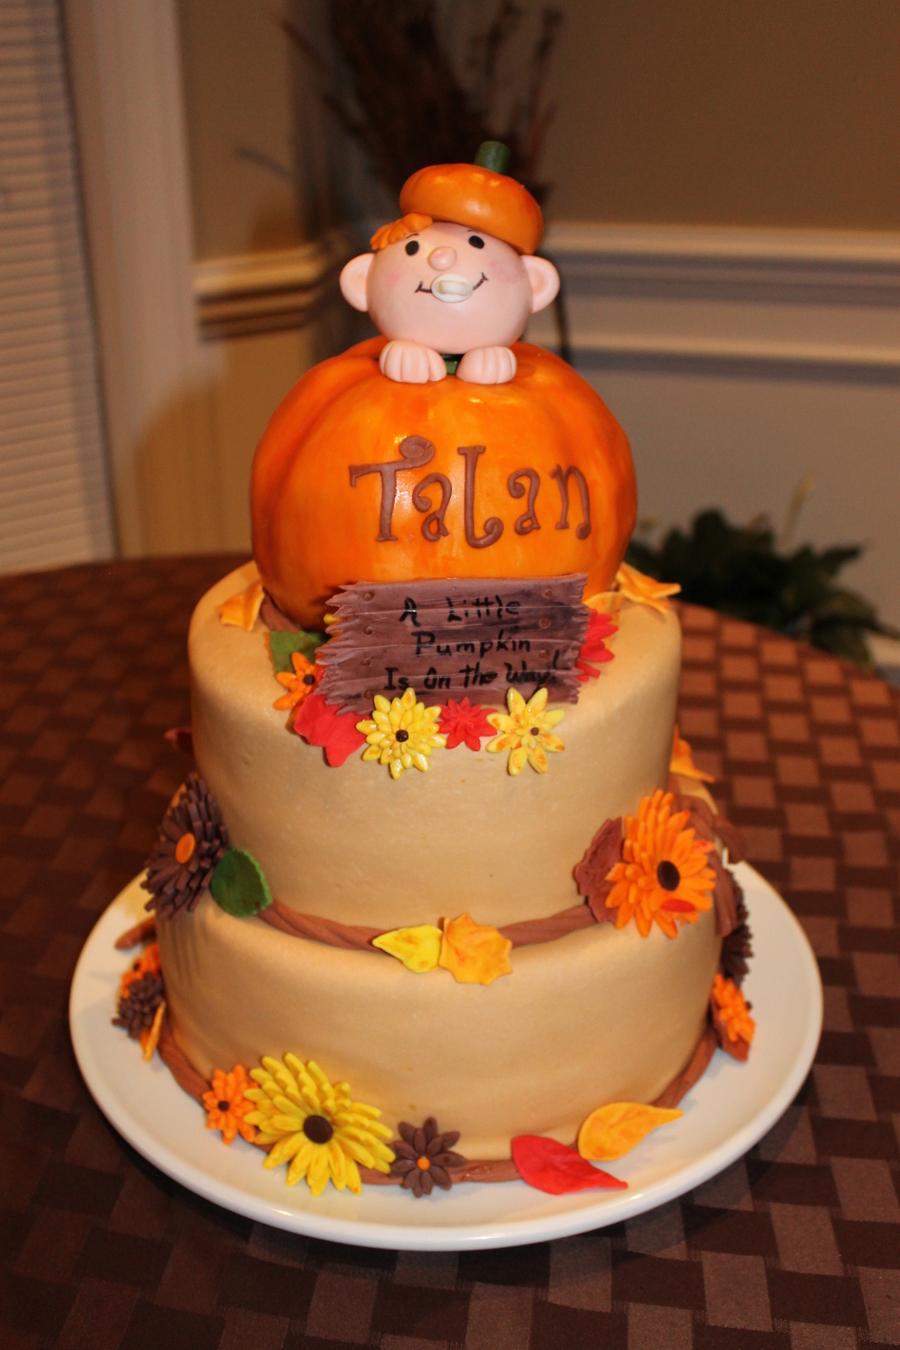 Little Princess Baby Shower Cake - CakeCentral.com